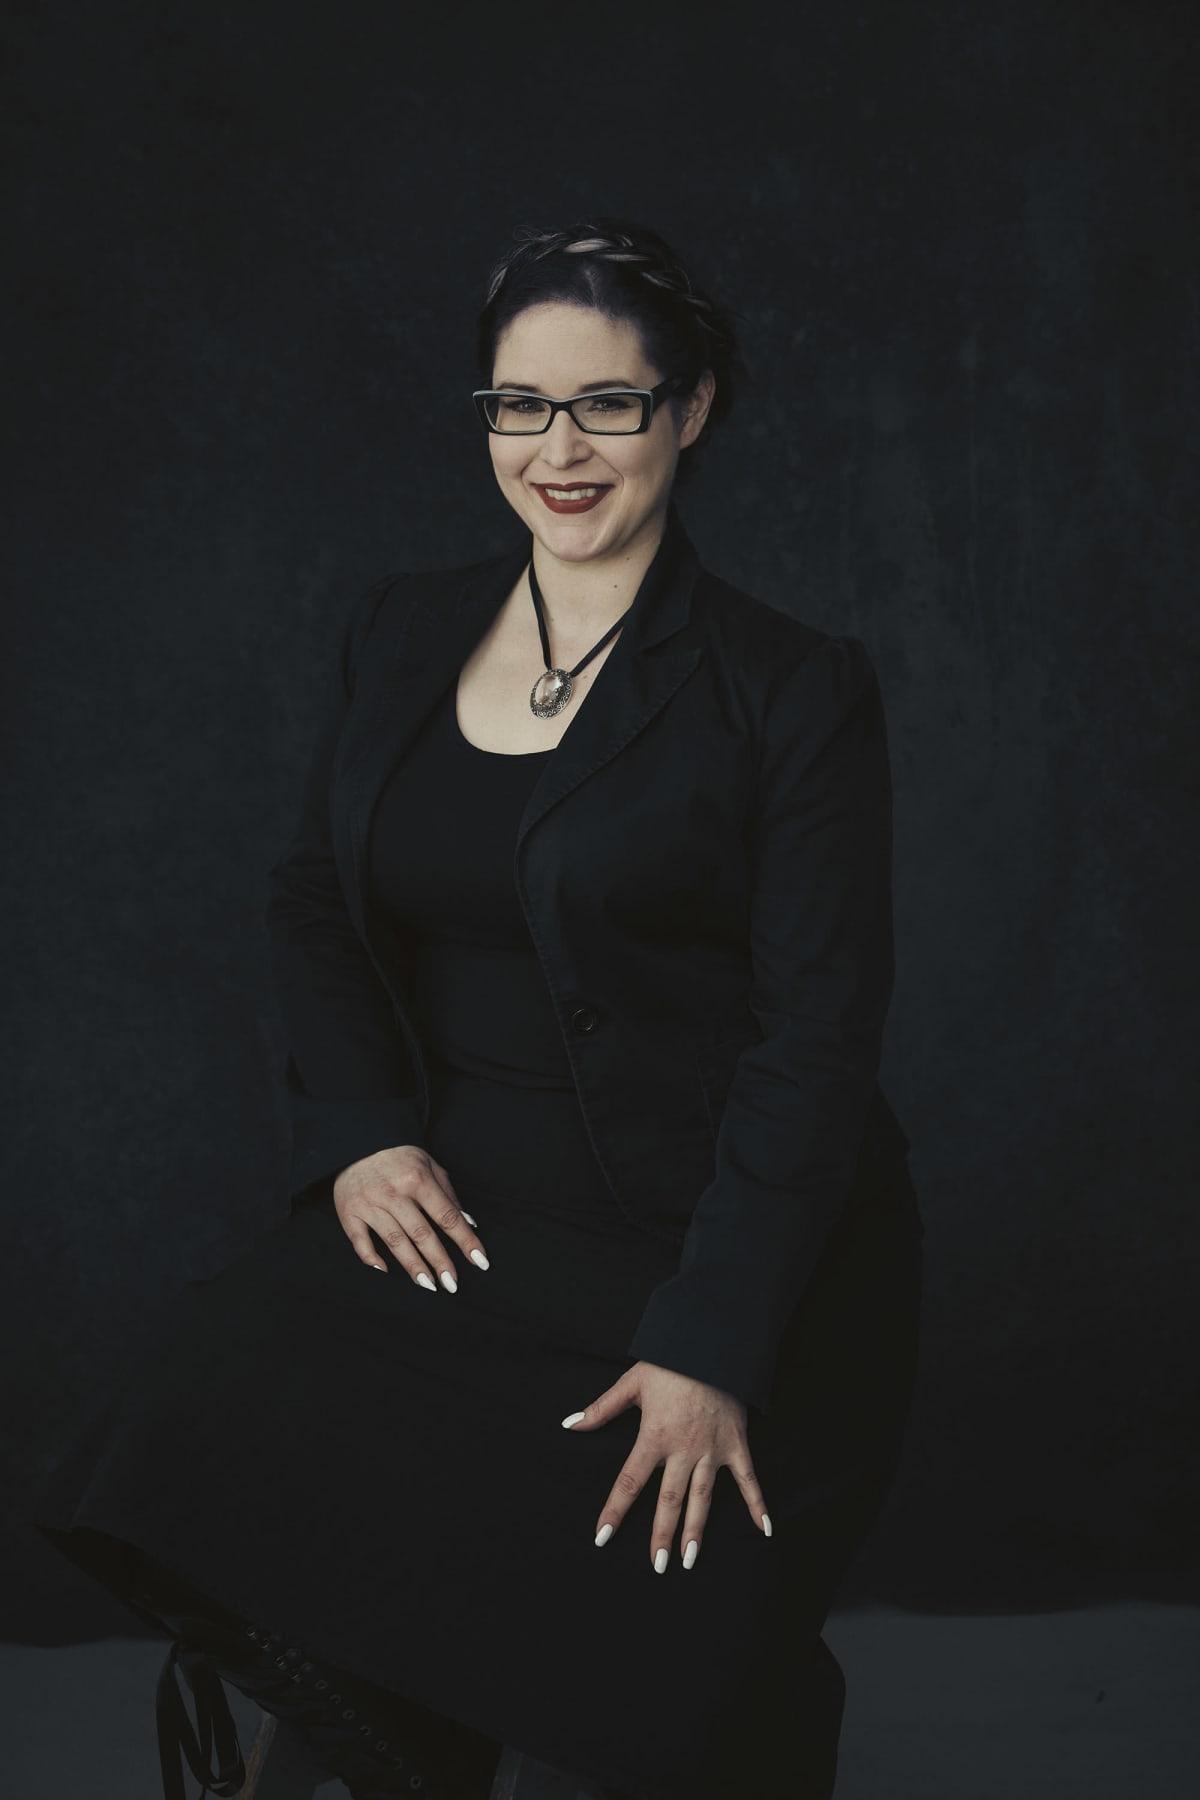 Kirjailija Maria Petterson